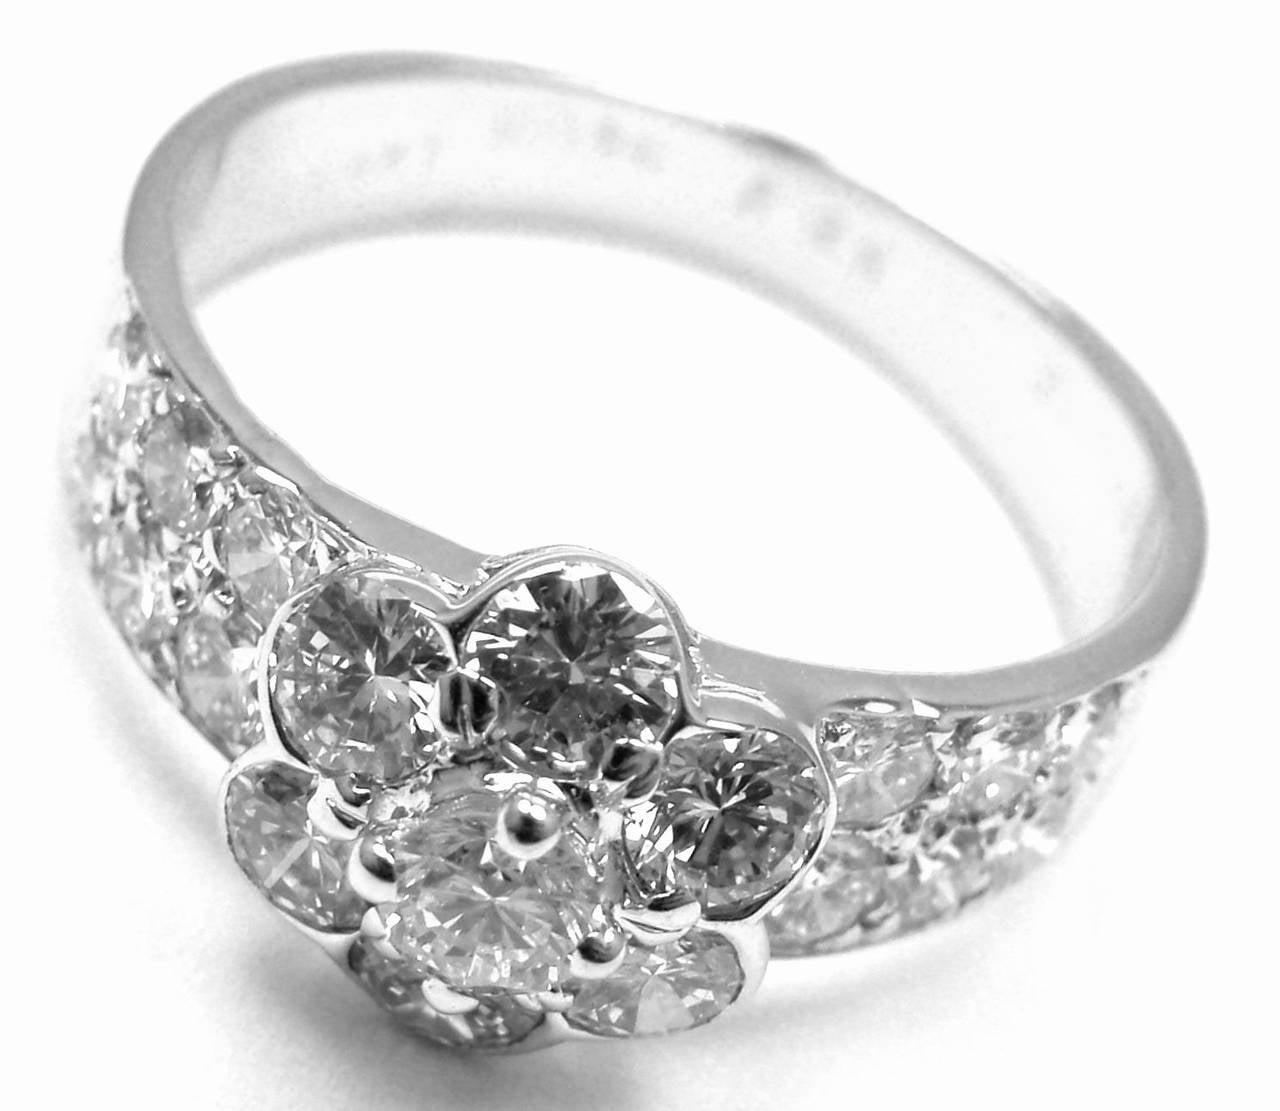 Van Cleef & Arpels Diamond Fleurette Flower Gold Ring 5